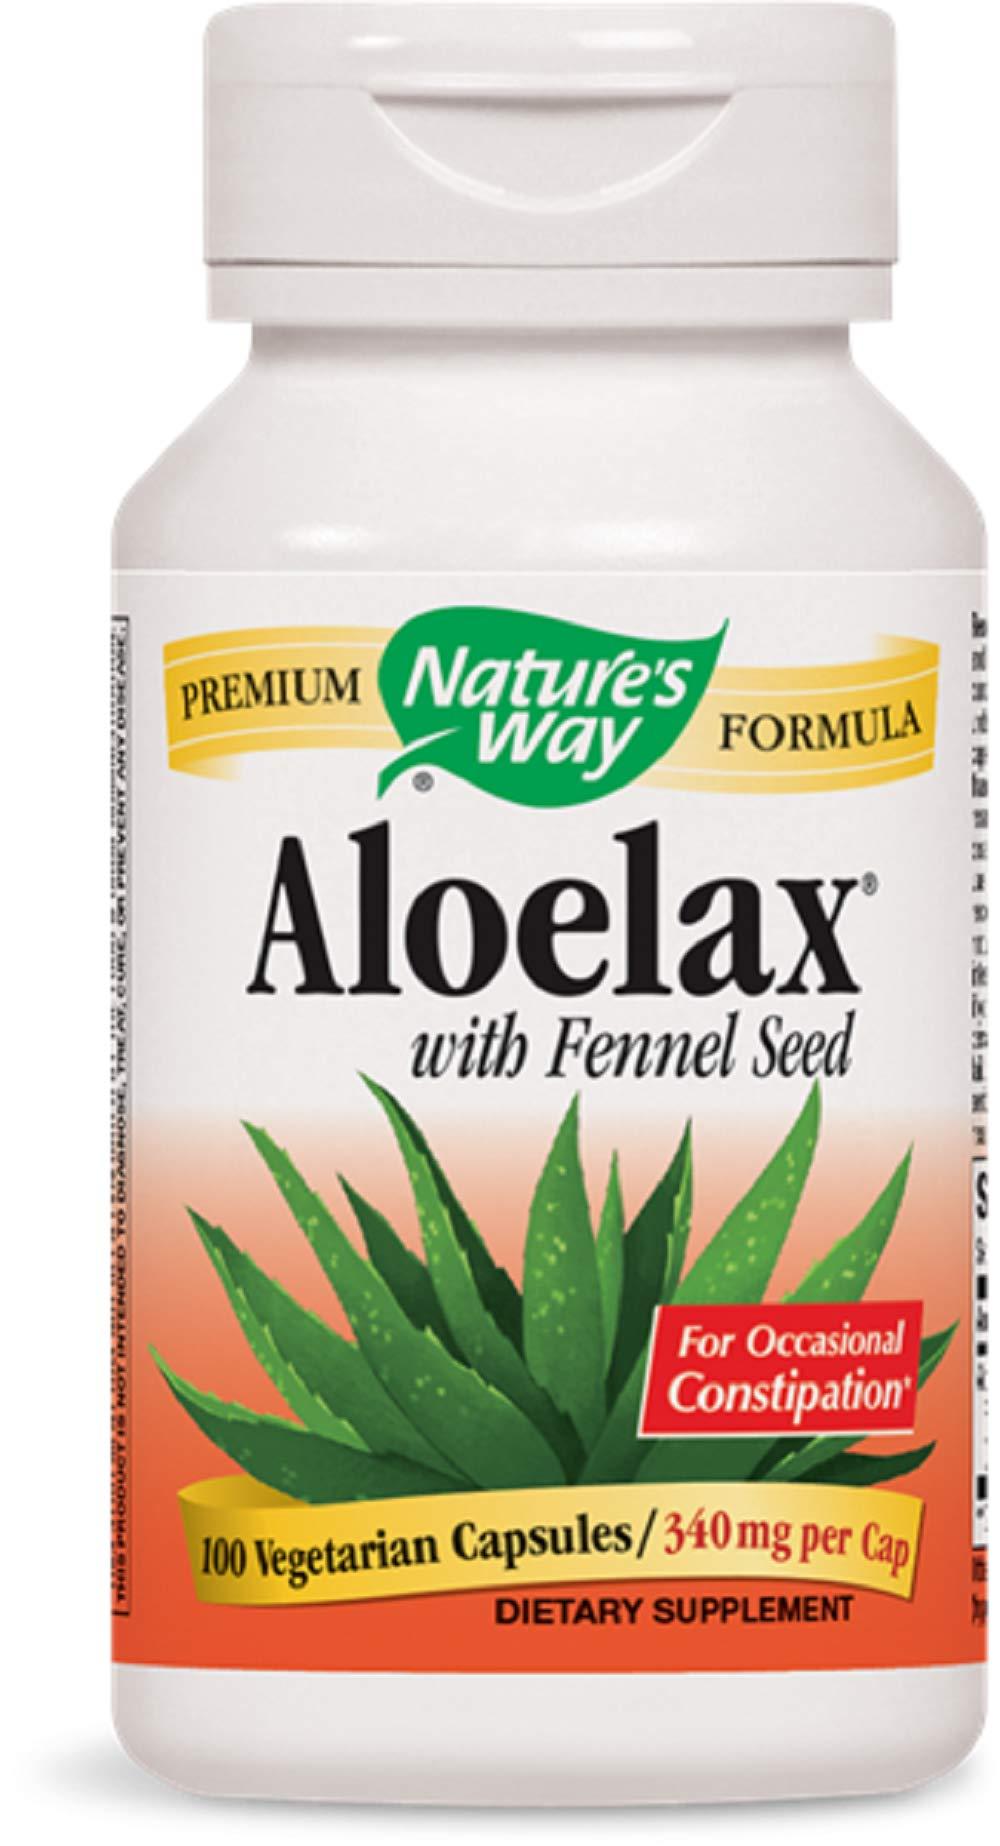 Natures Way AloeLax, 340 milligrams, 100 Vegatarian Capsules. Pack of 9 Bottles Pack 9